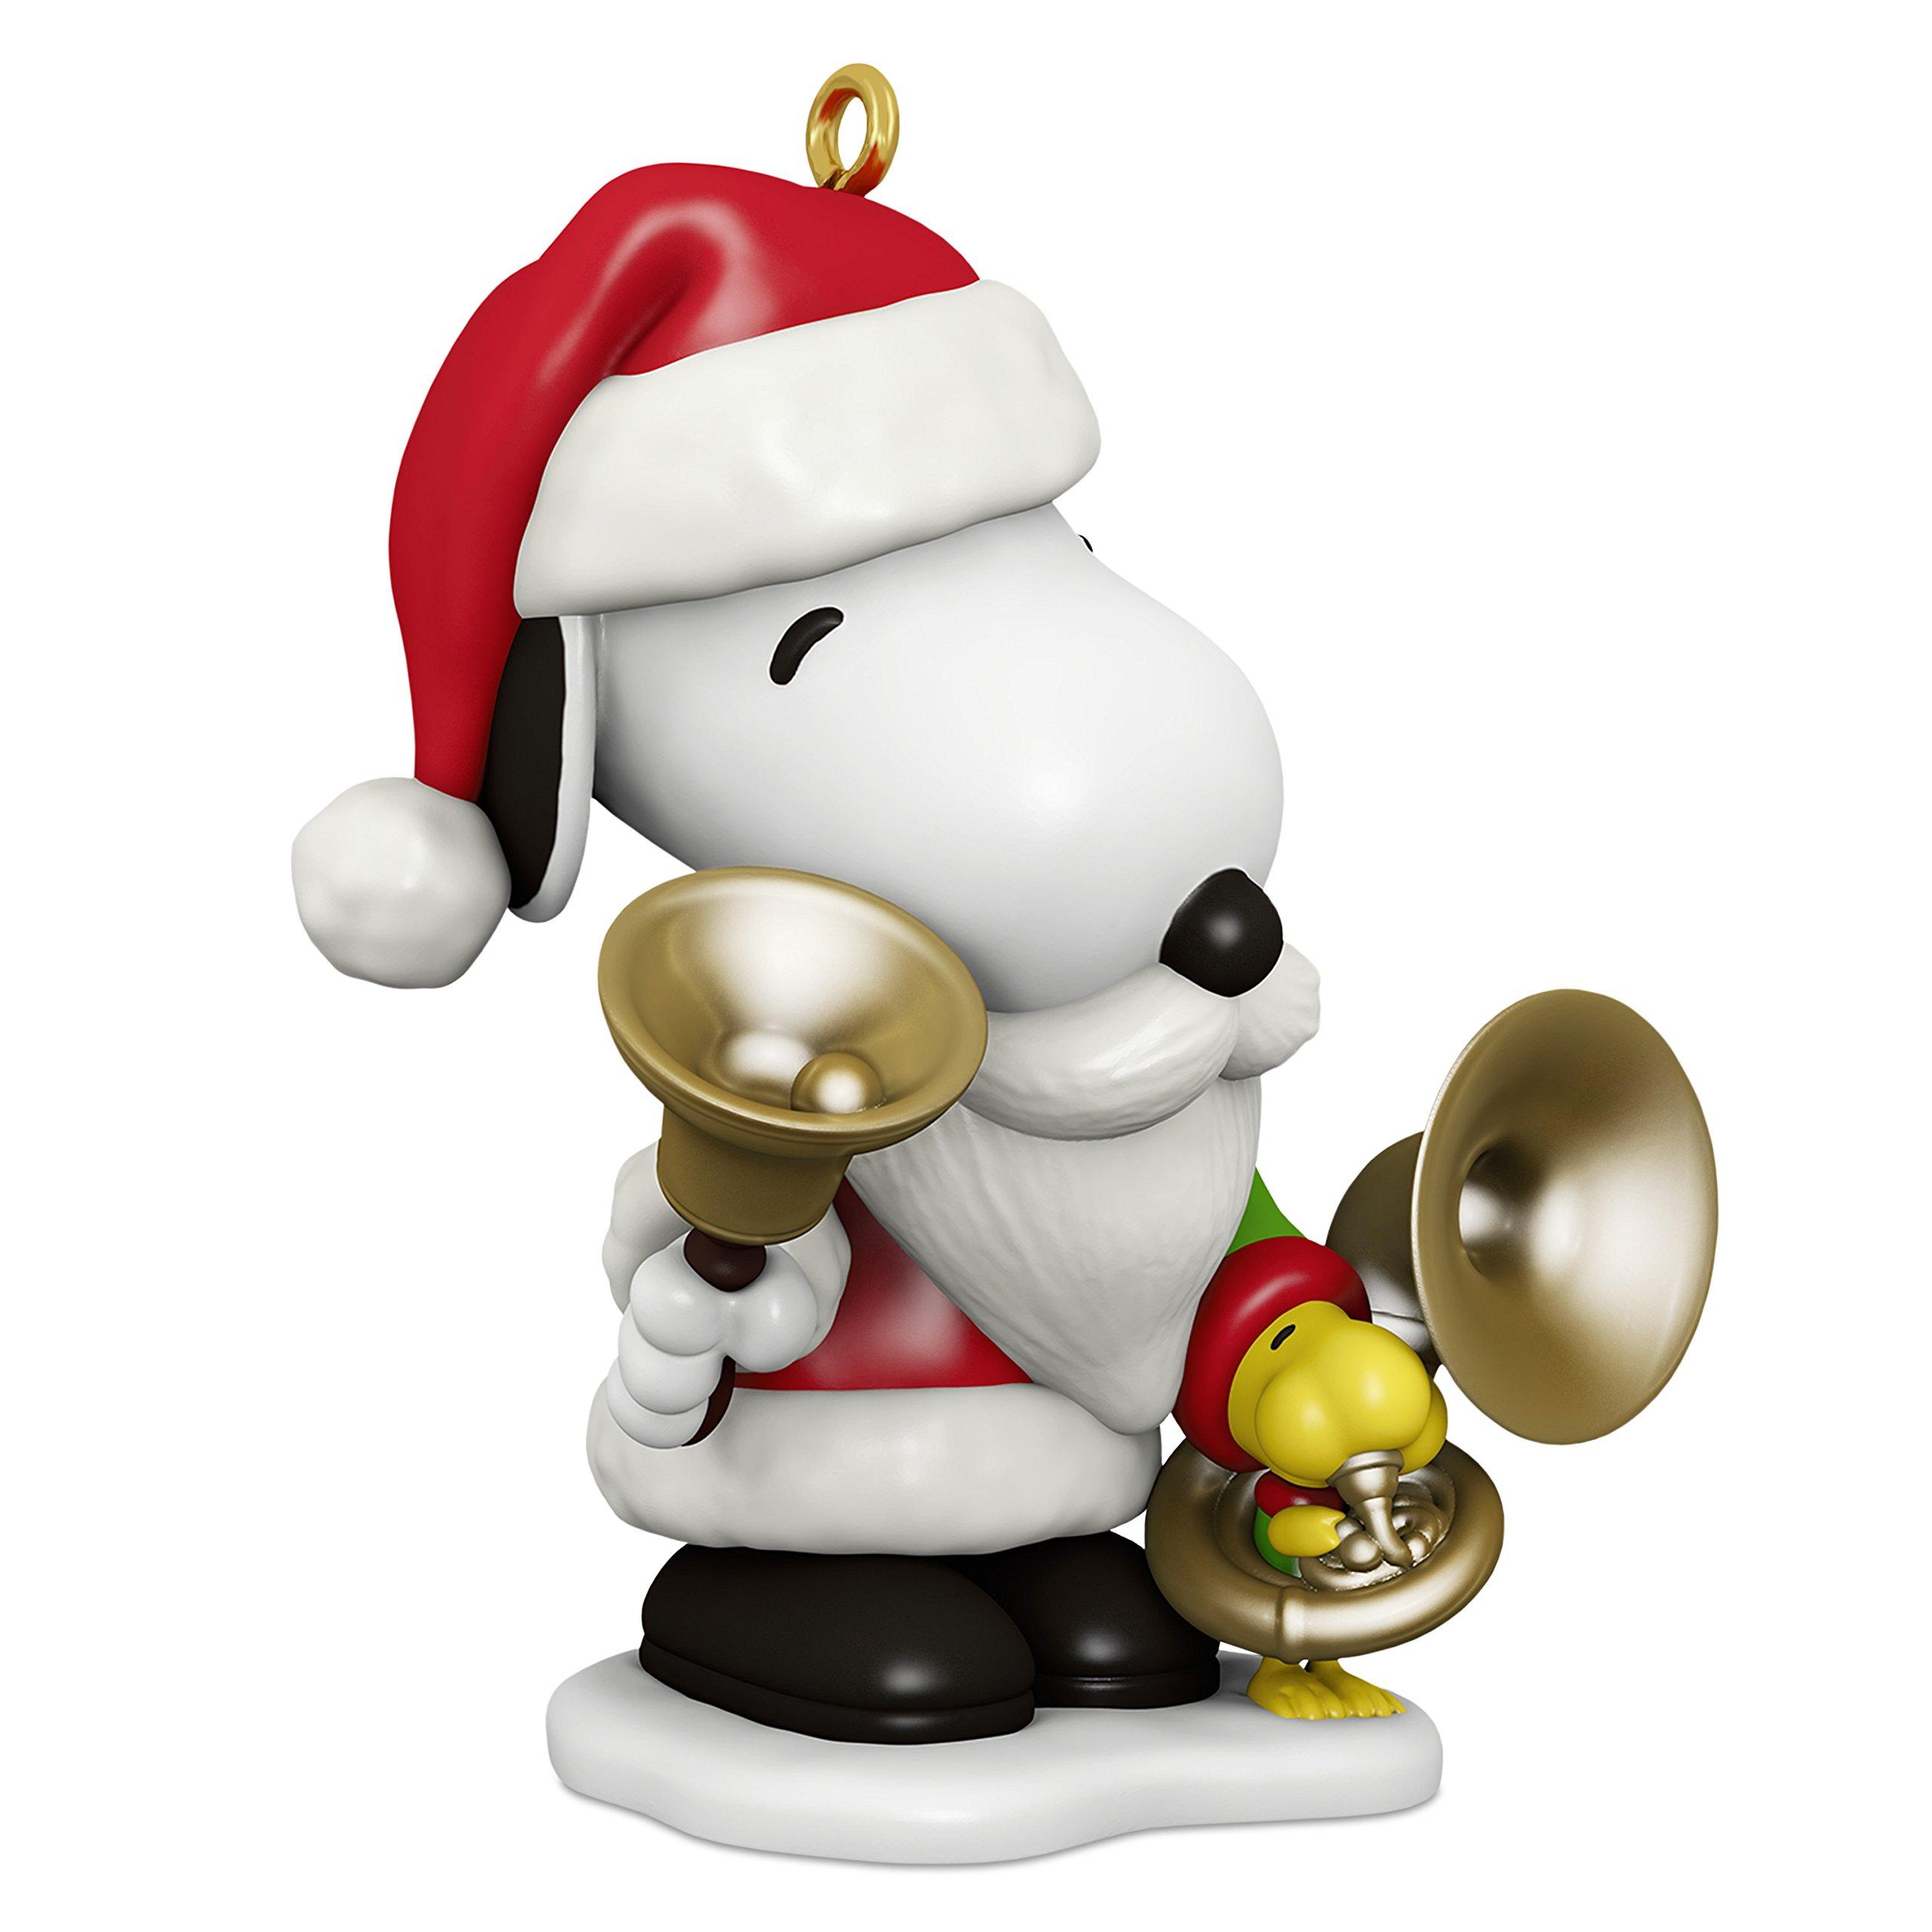 Hallmark Keepsake Christmas Ornament 2018 Year Dated: Hallmark 2018 Peanuts Spotlight On Snoopy Bell Ringer